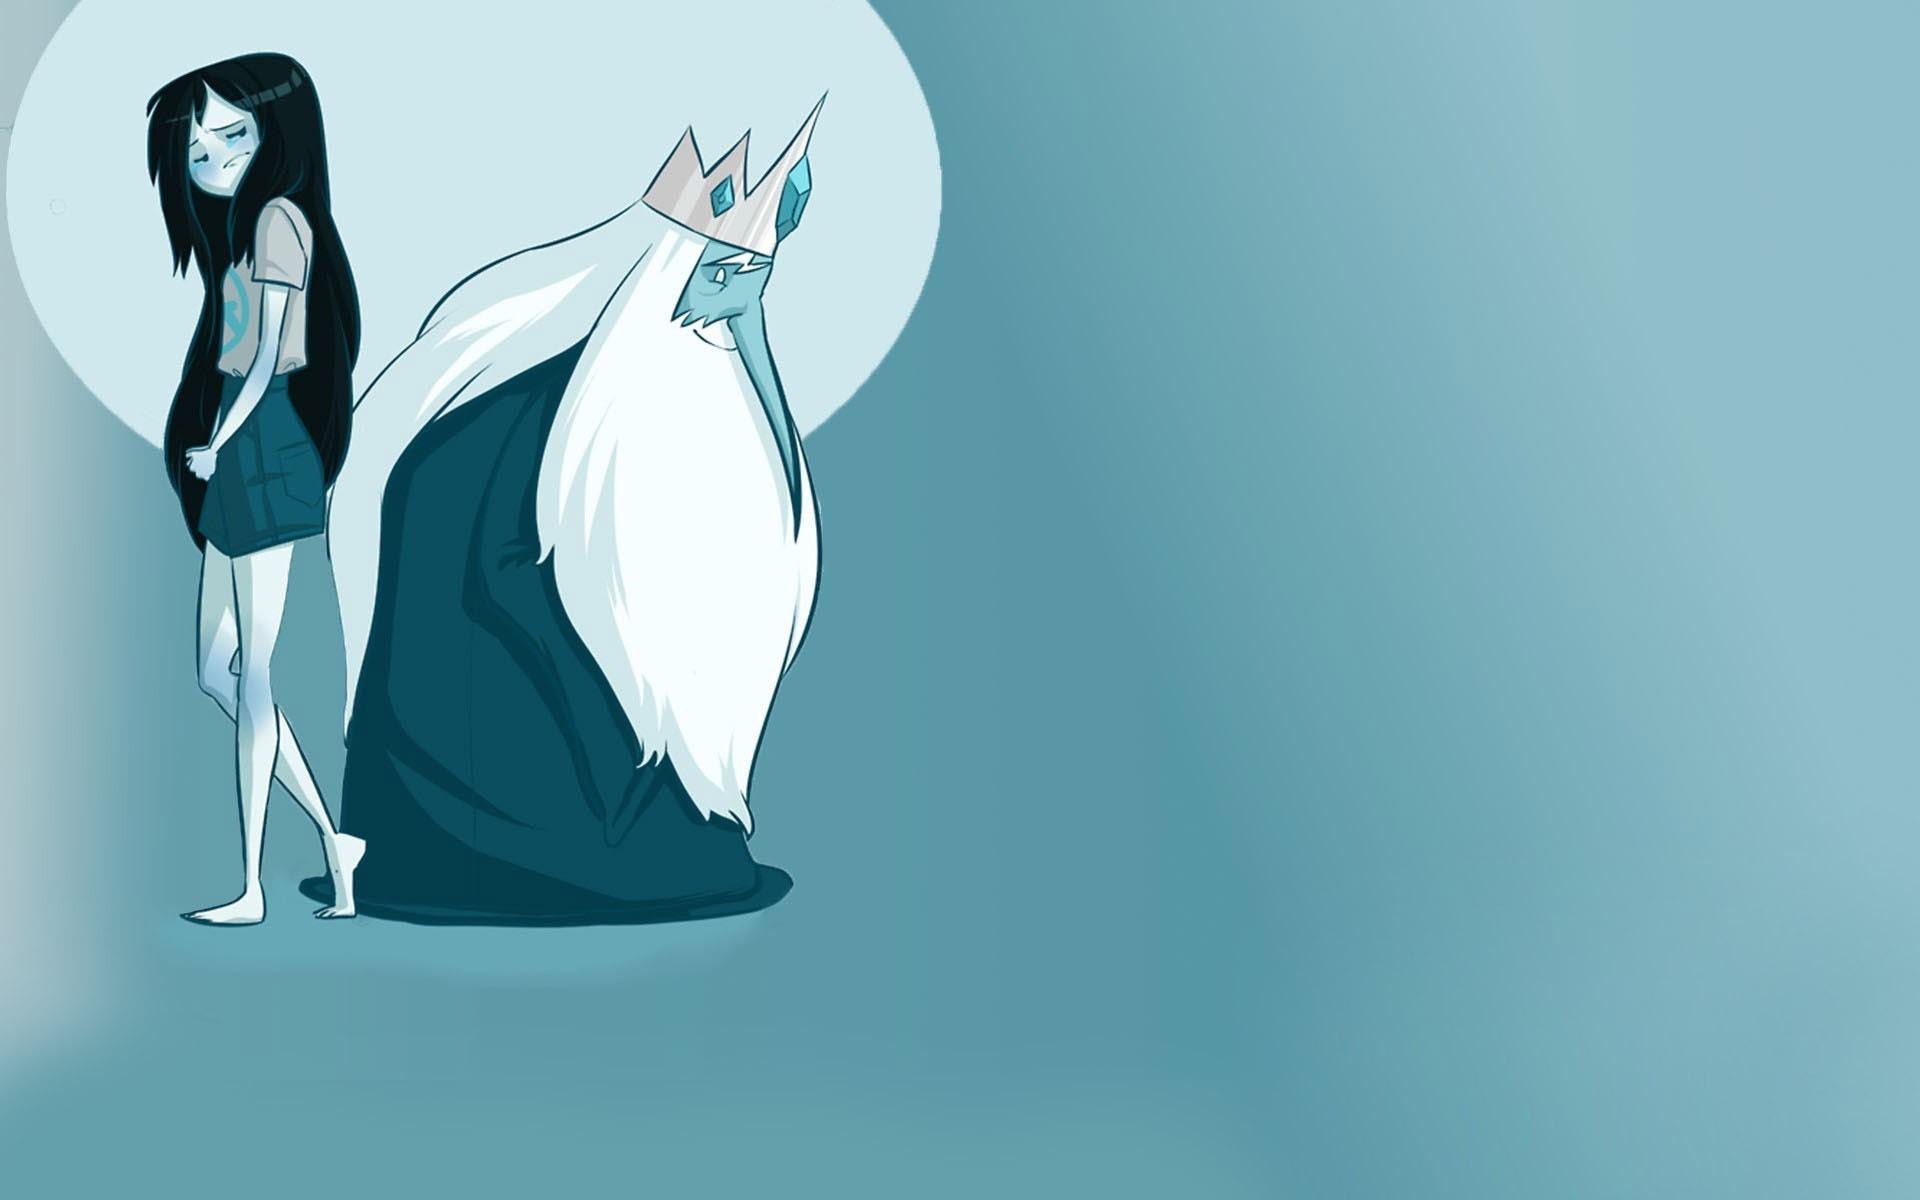 Illustration Anime Blue Cartoon Adventure Time Ice King Marceline The Vampire Queen Computer Wallpaper